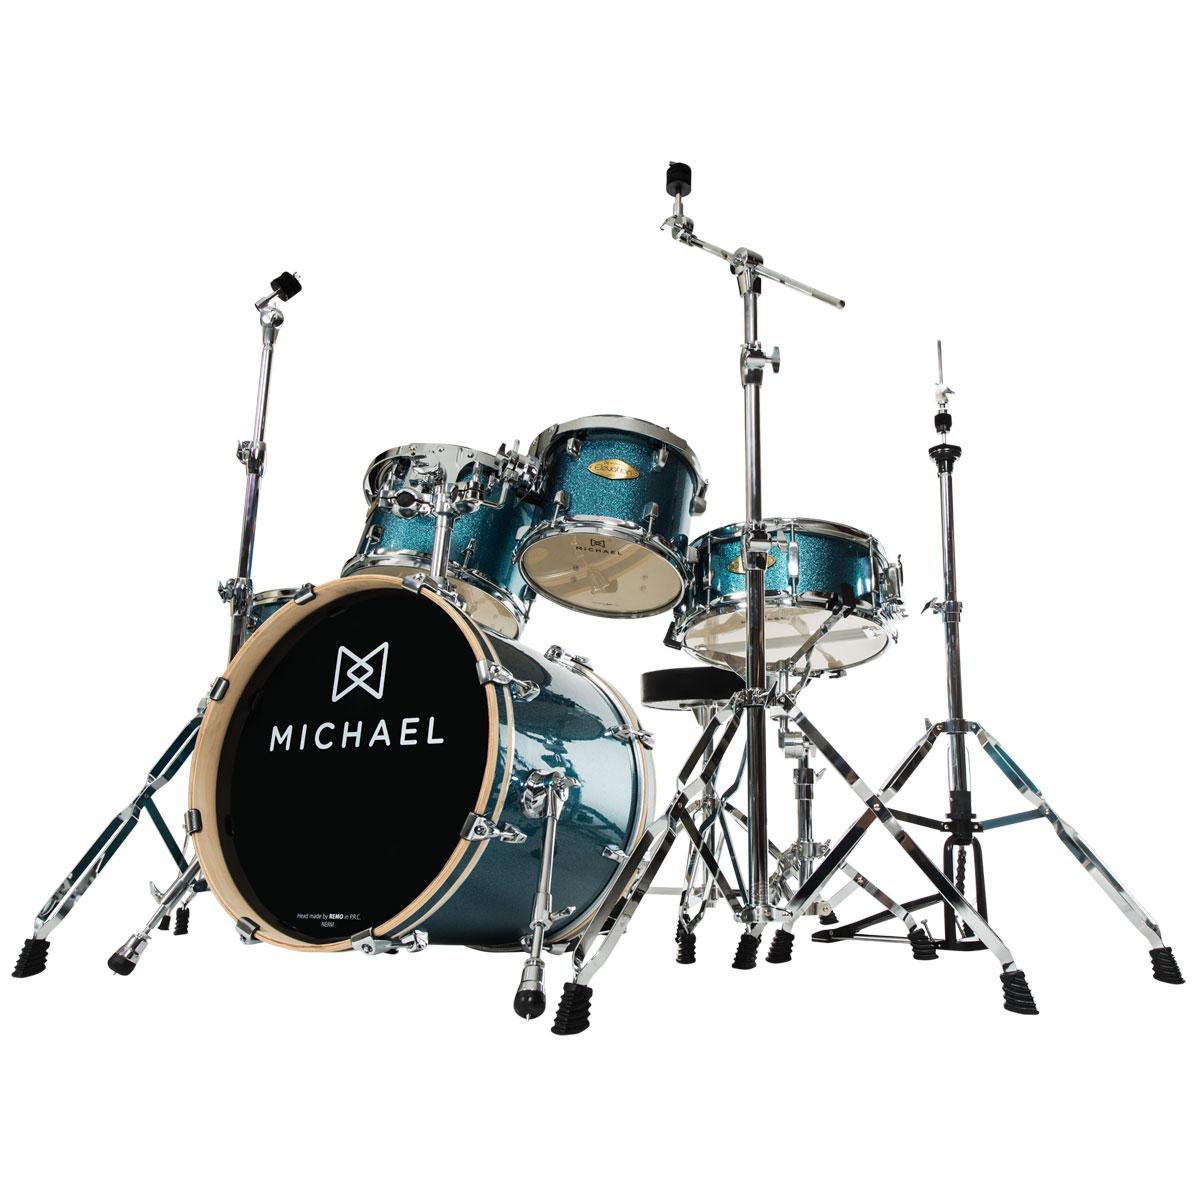 Bateria Acústica Bumbo 22 Polegadas Elevation DM853 BLS Azul Sparkle - Michael